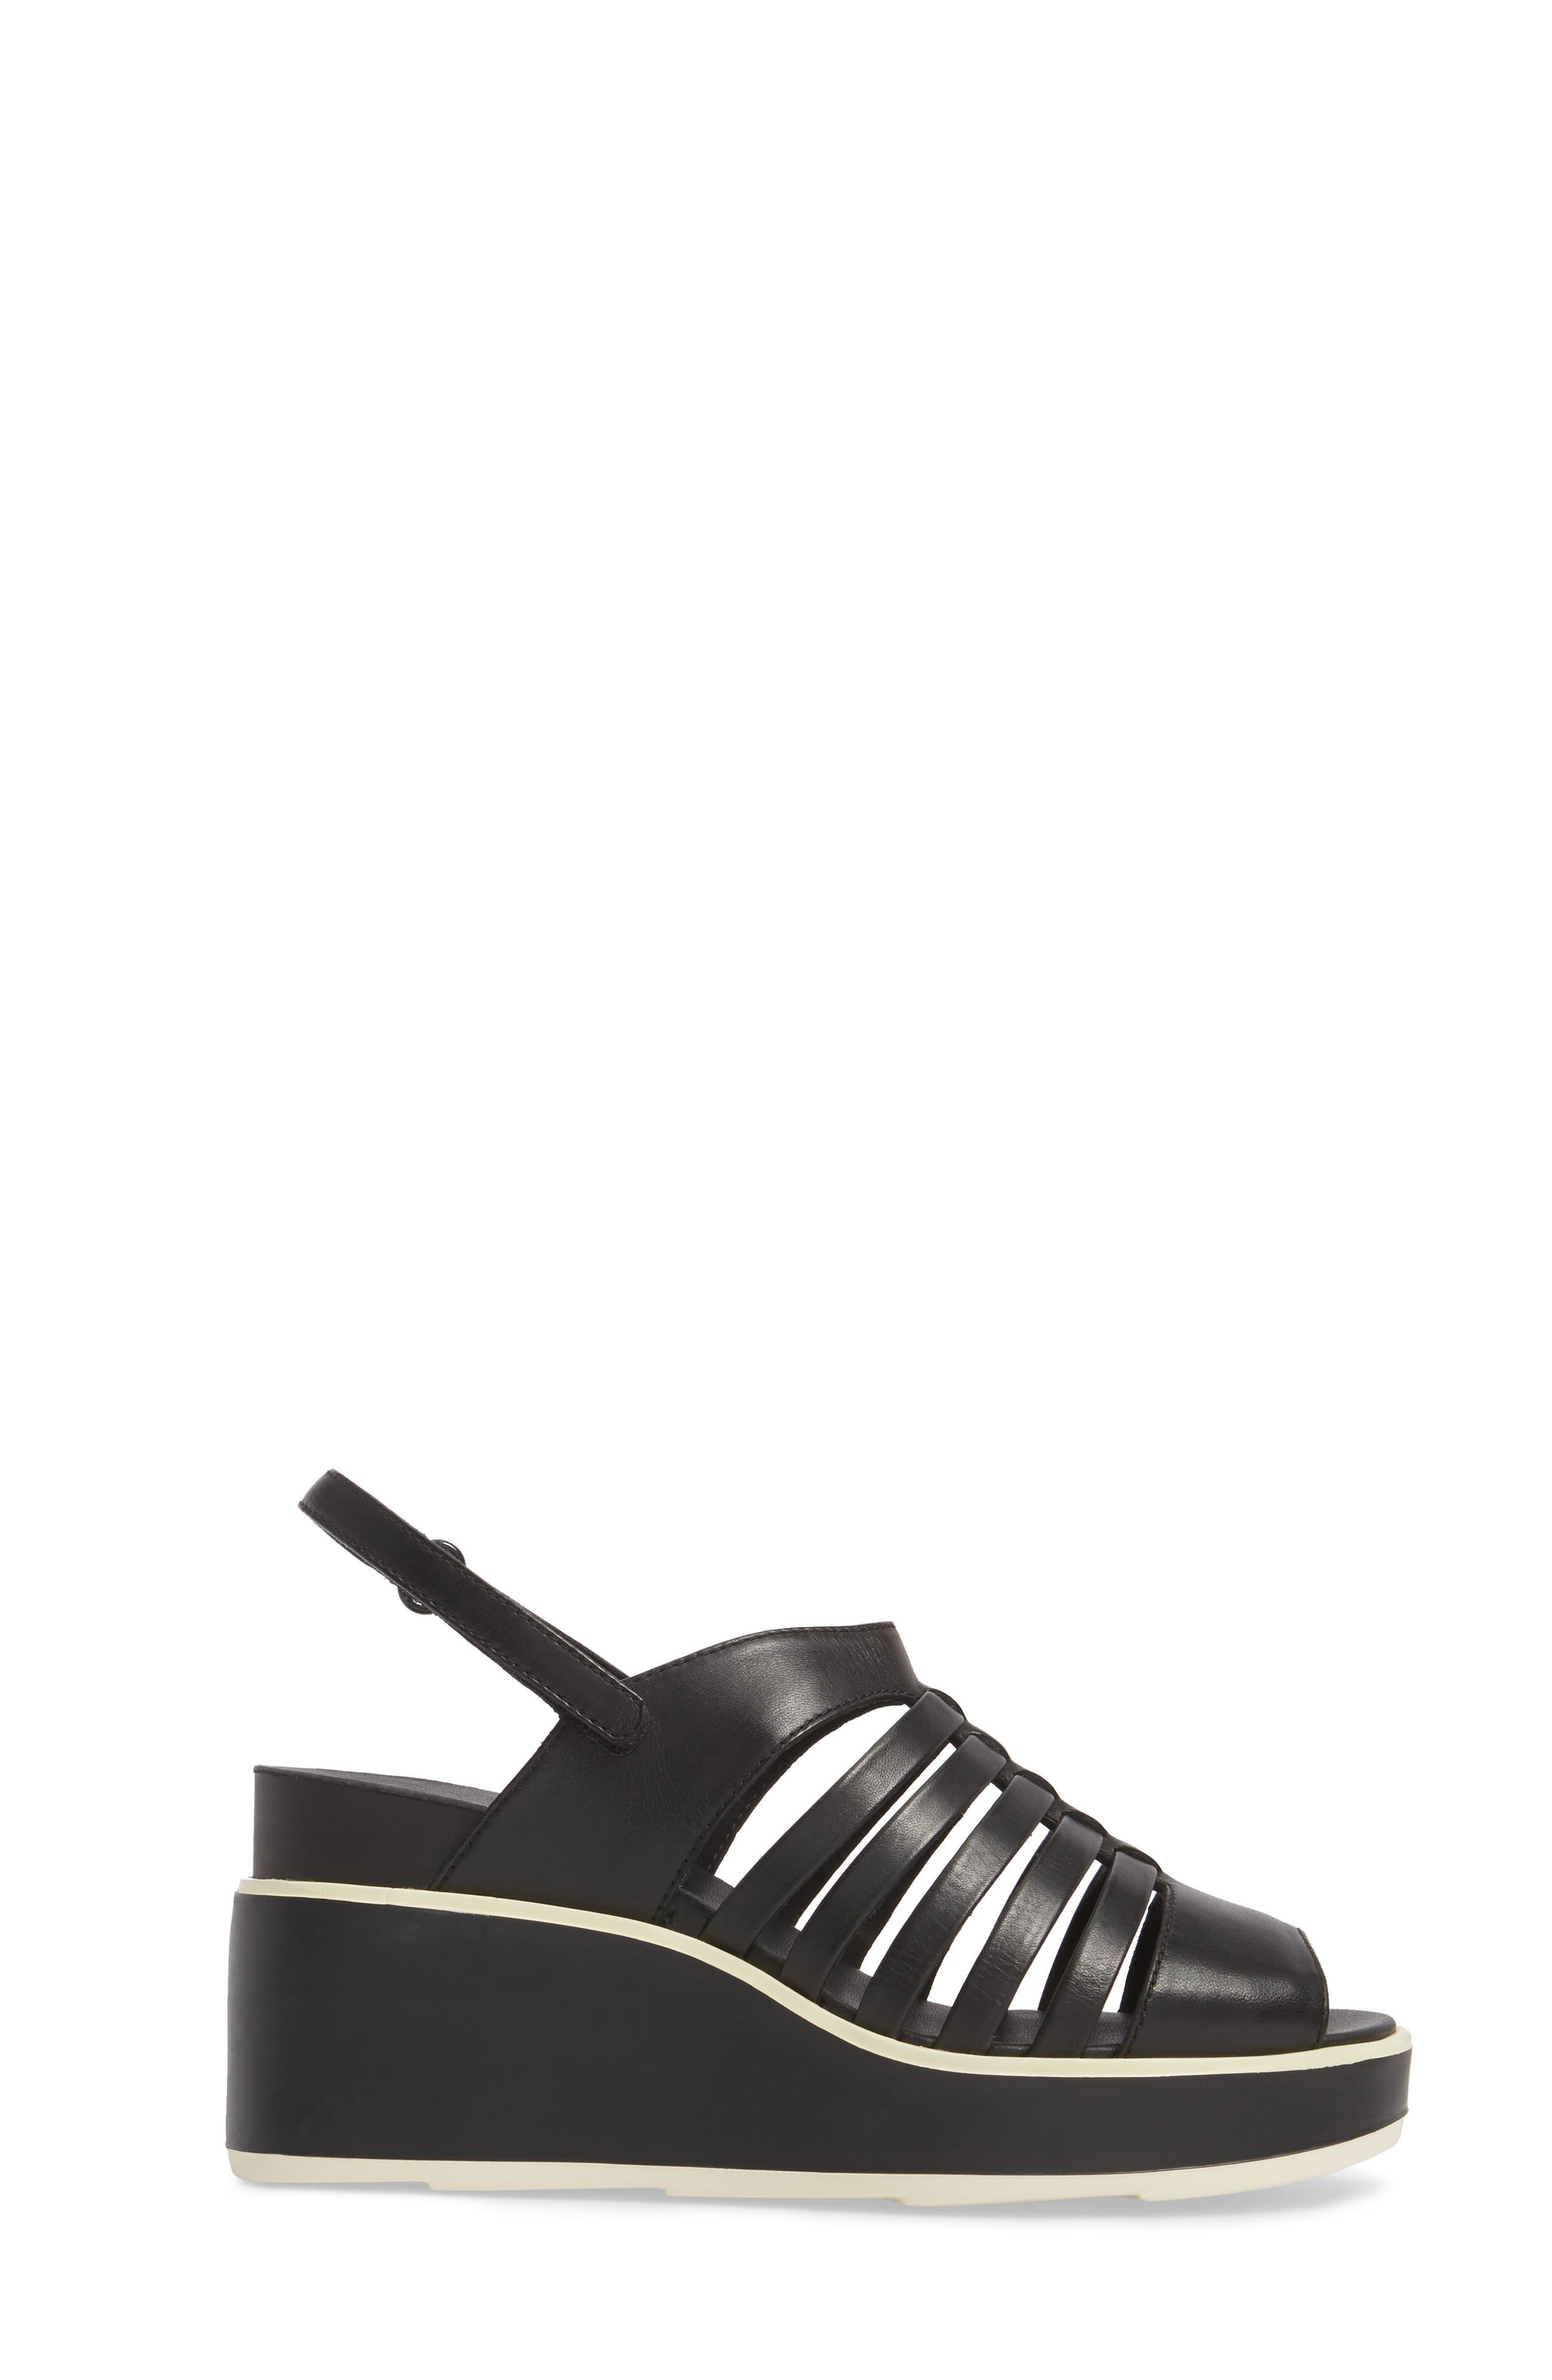 Tropik Strappy Wedge Sandal,                             Alternate thumbnail 3, color,                             002